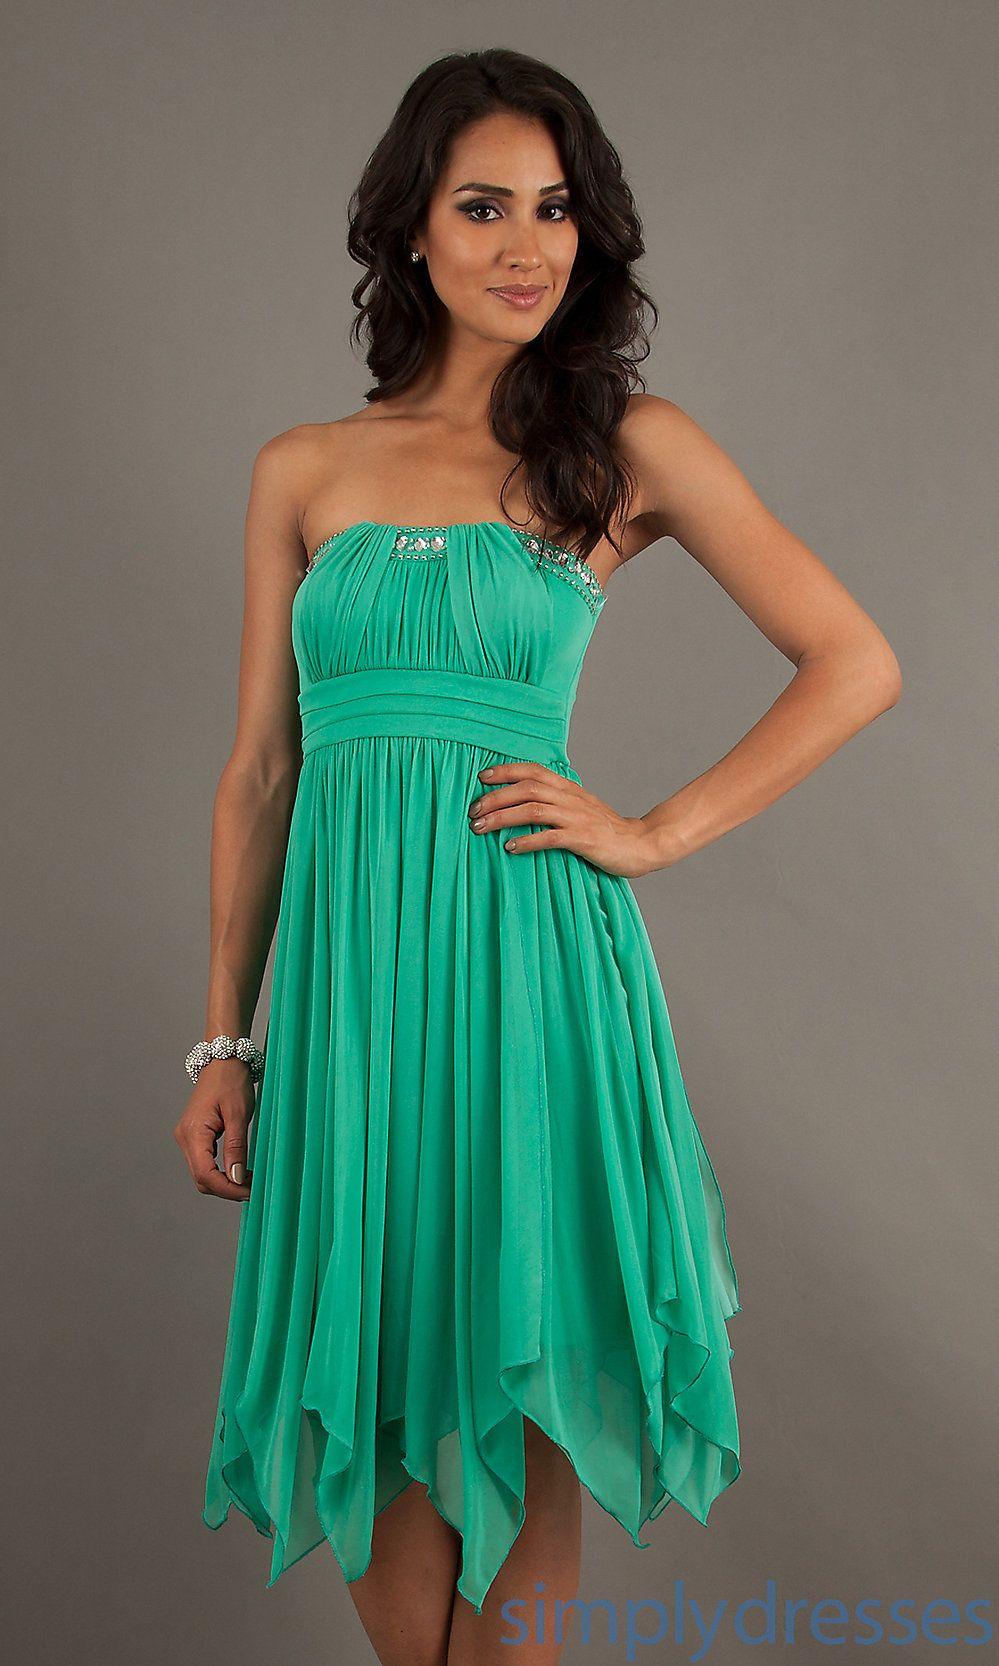 Teens 2015 Nice Party Dress Elegant | Teens 2015 Nice Party Dress ...